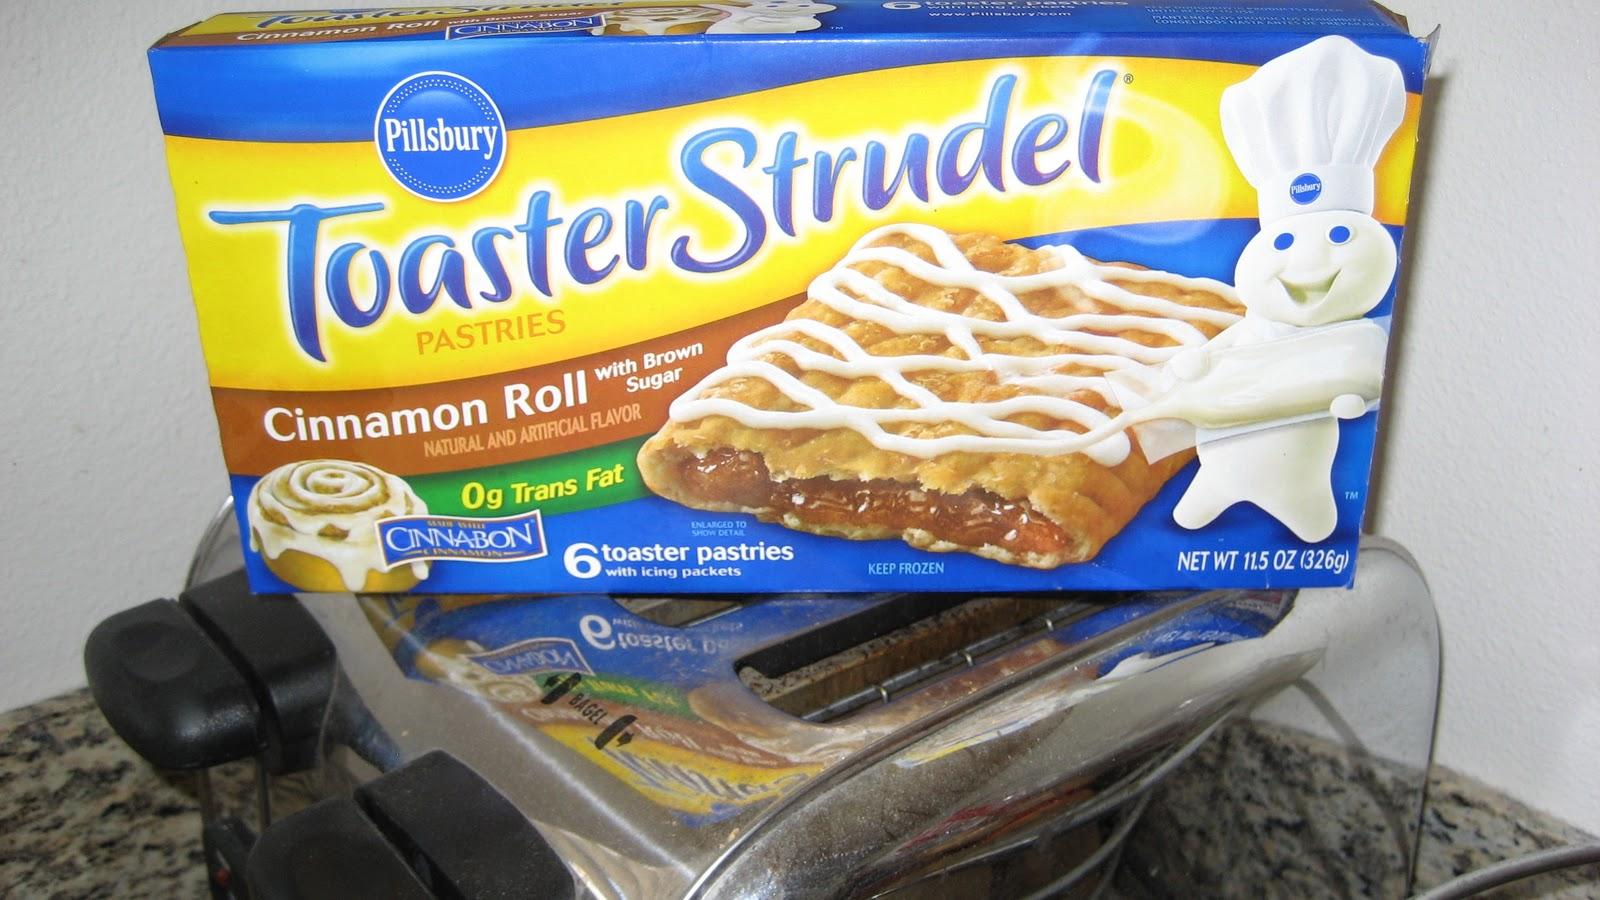 ... }: Cinnamon Toaster Strudel with Brown Sugar and Cinnabon Cinnamon